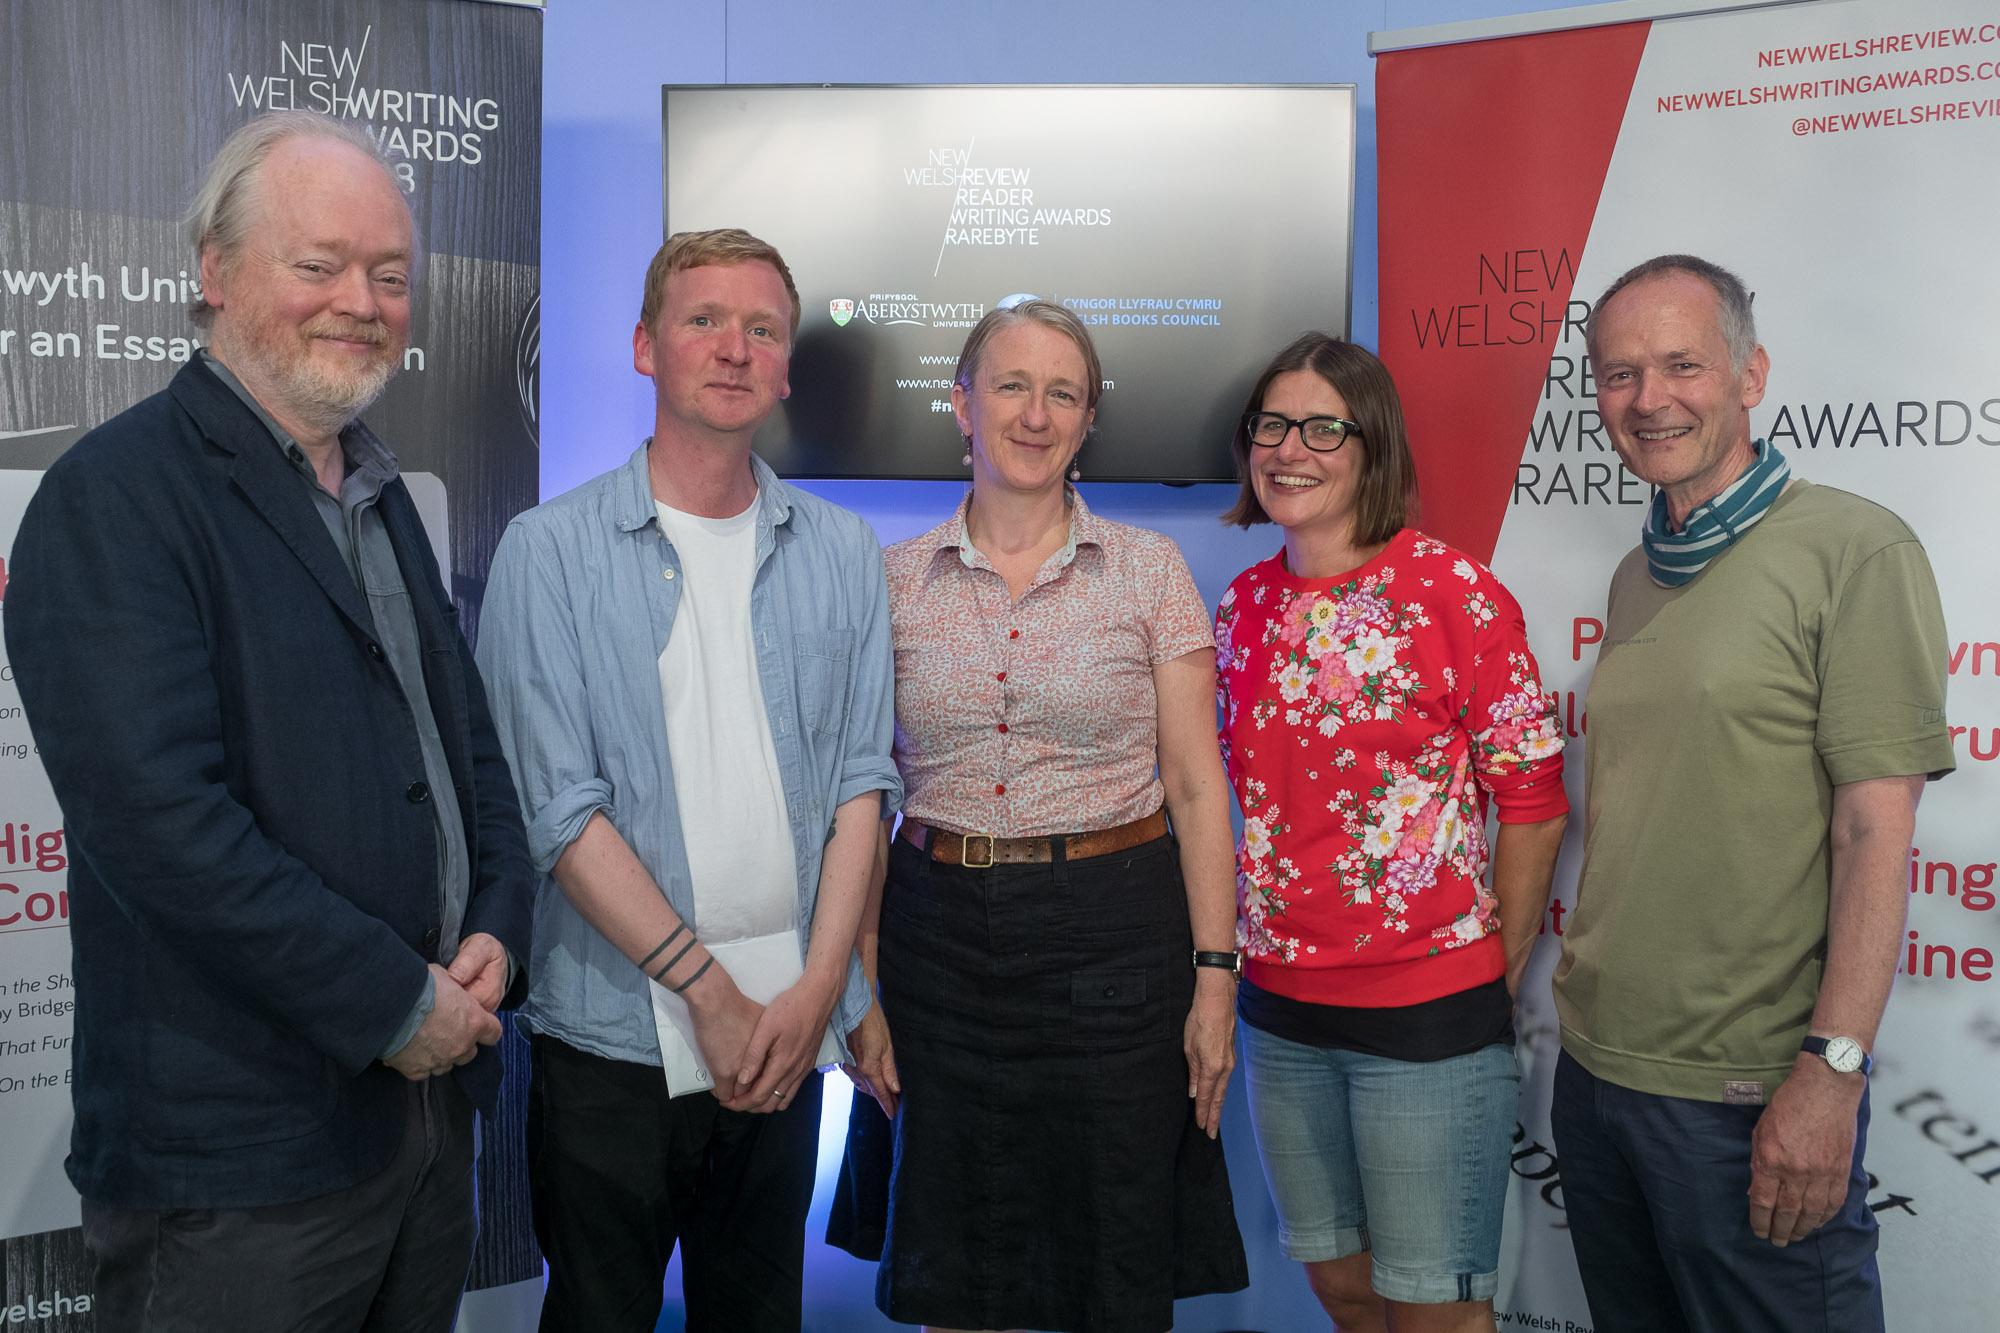 L-R: Matthew Francis, Ed Garland, Gwen Davies, Cathryn Summerhayes & Andrew Green. Pic: Keith Morris.